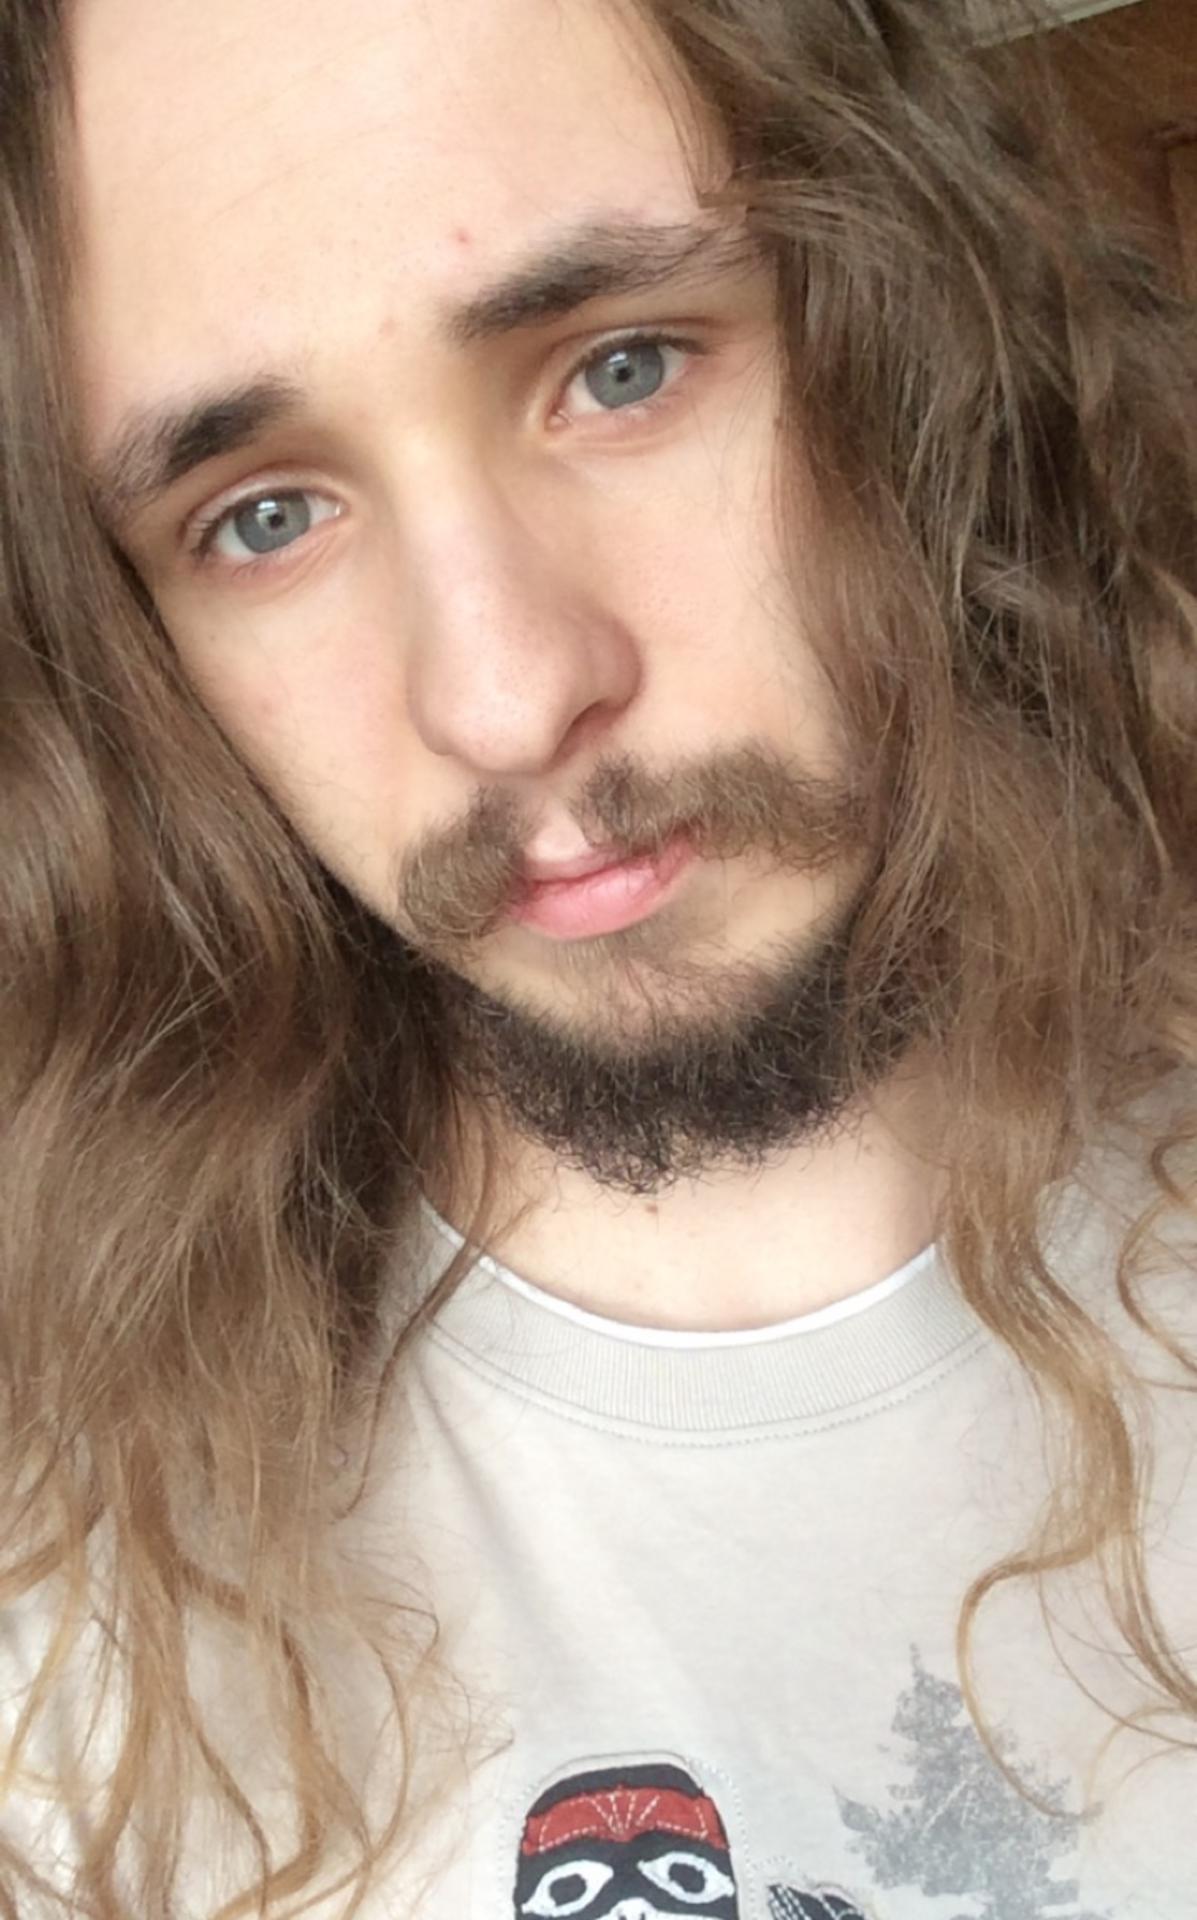 Daniel Cottam with long hair and beard